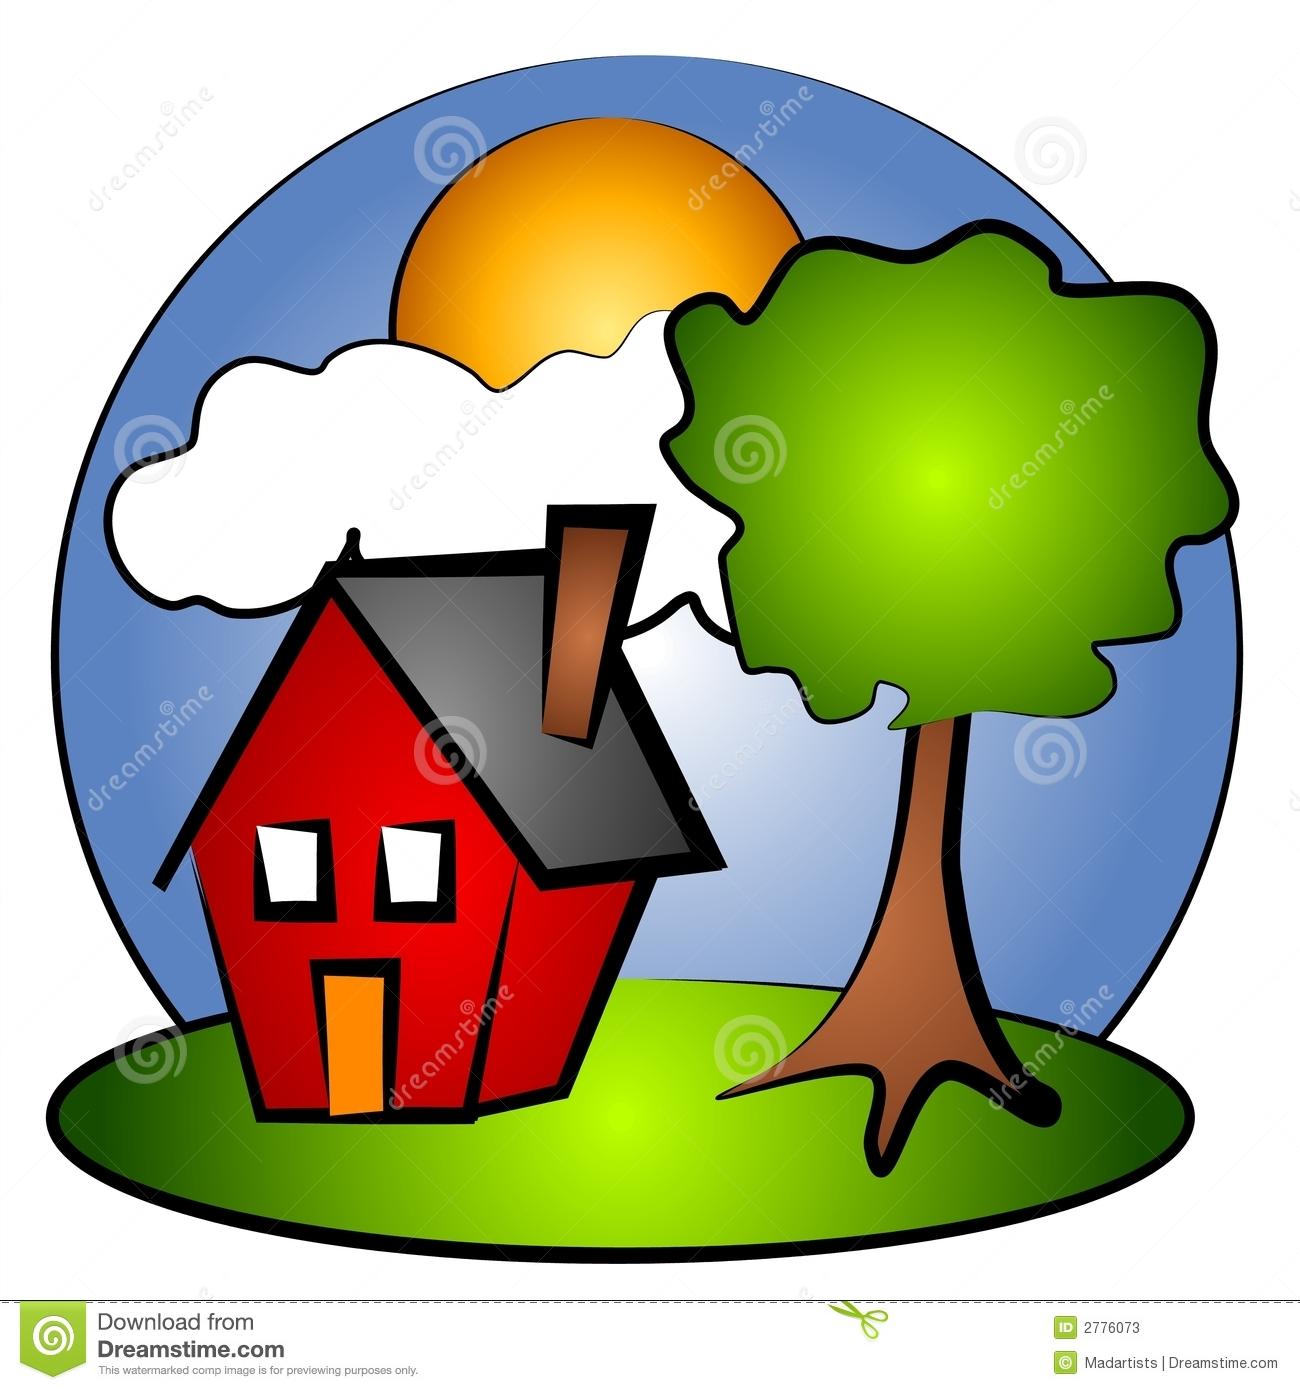 free clip art photos of homes - photo #33